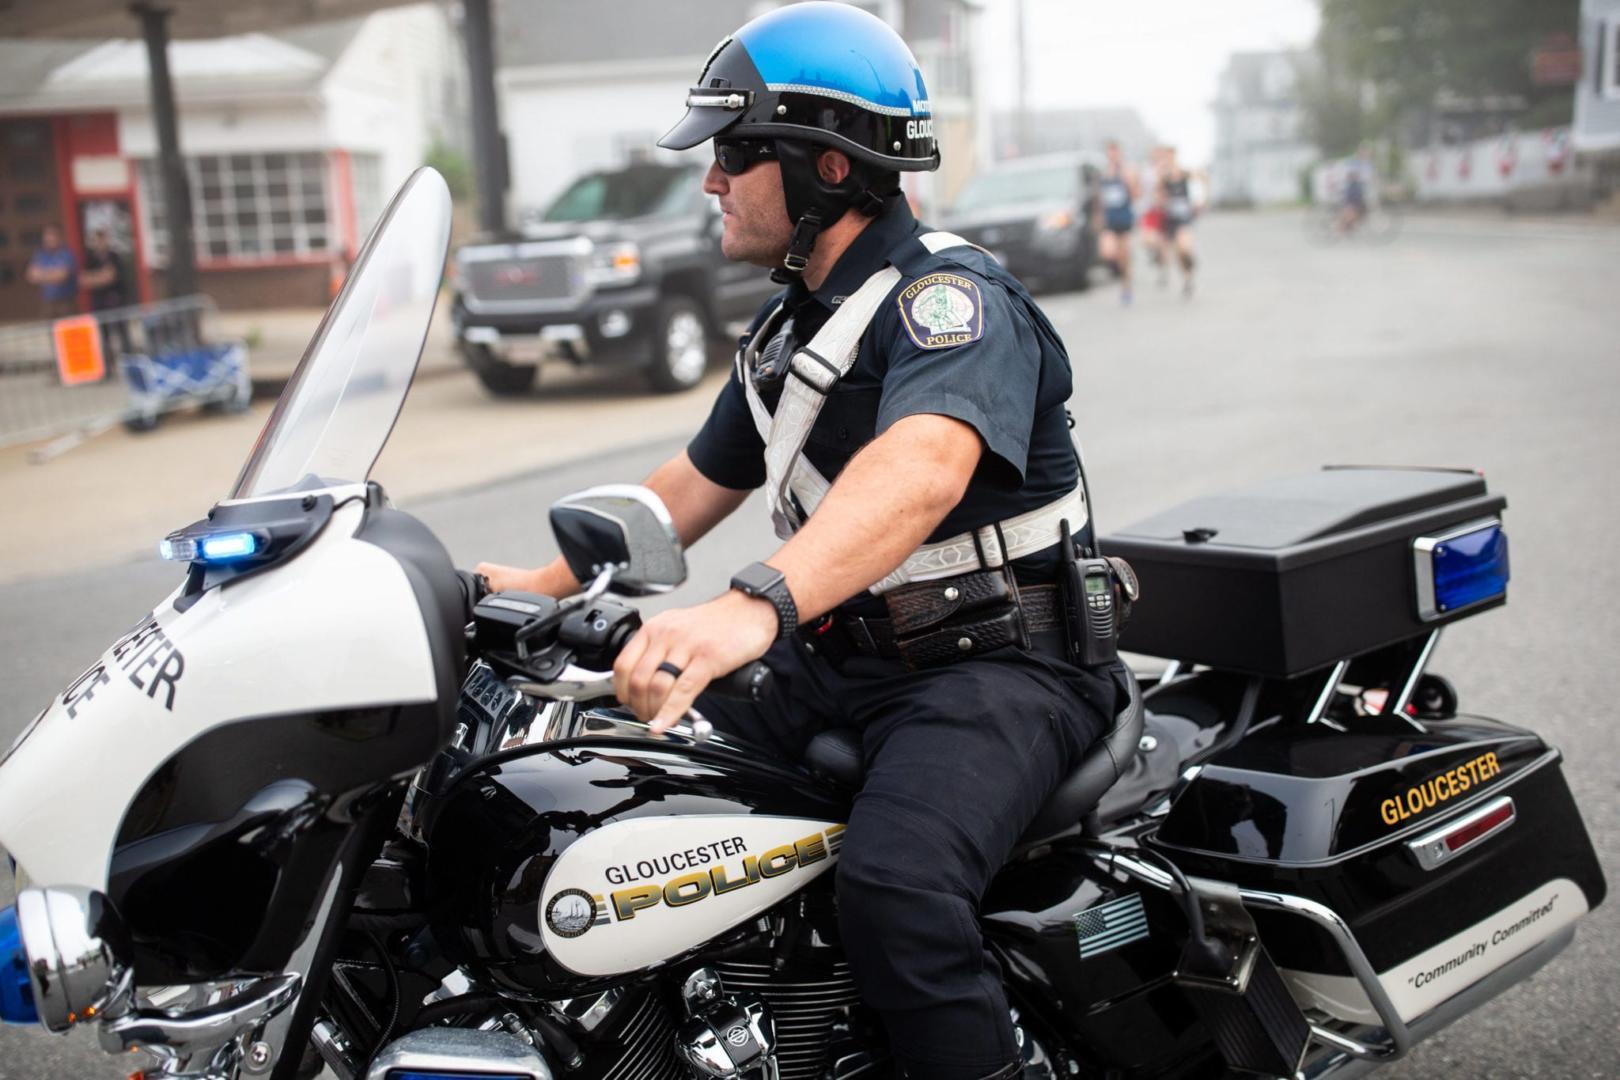 Gloucester Police